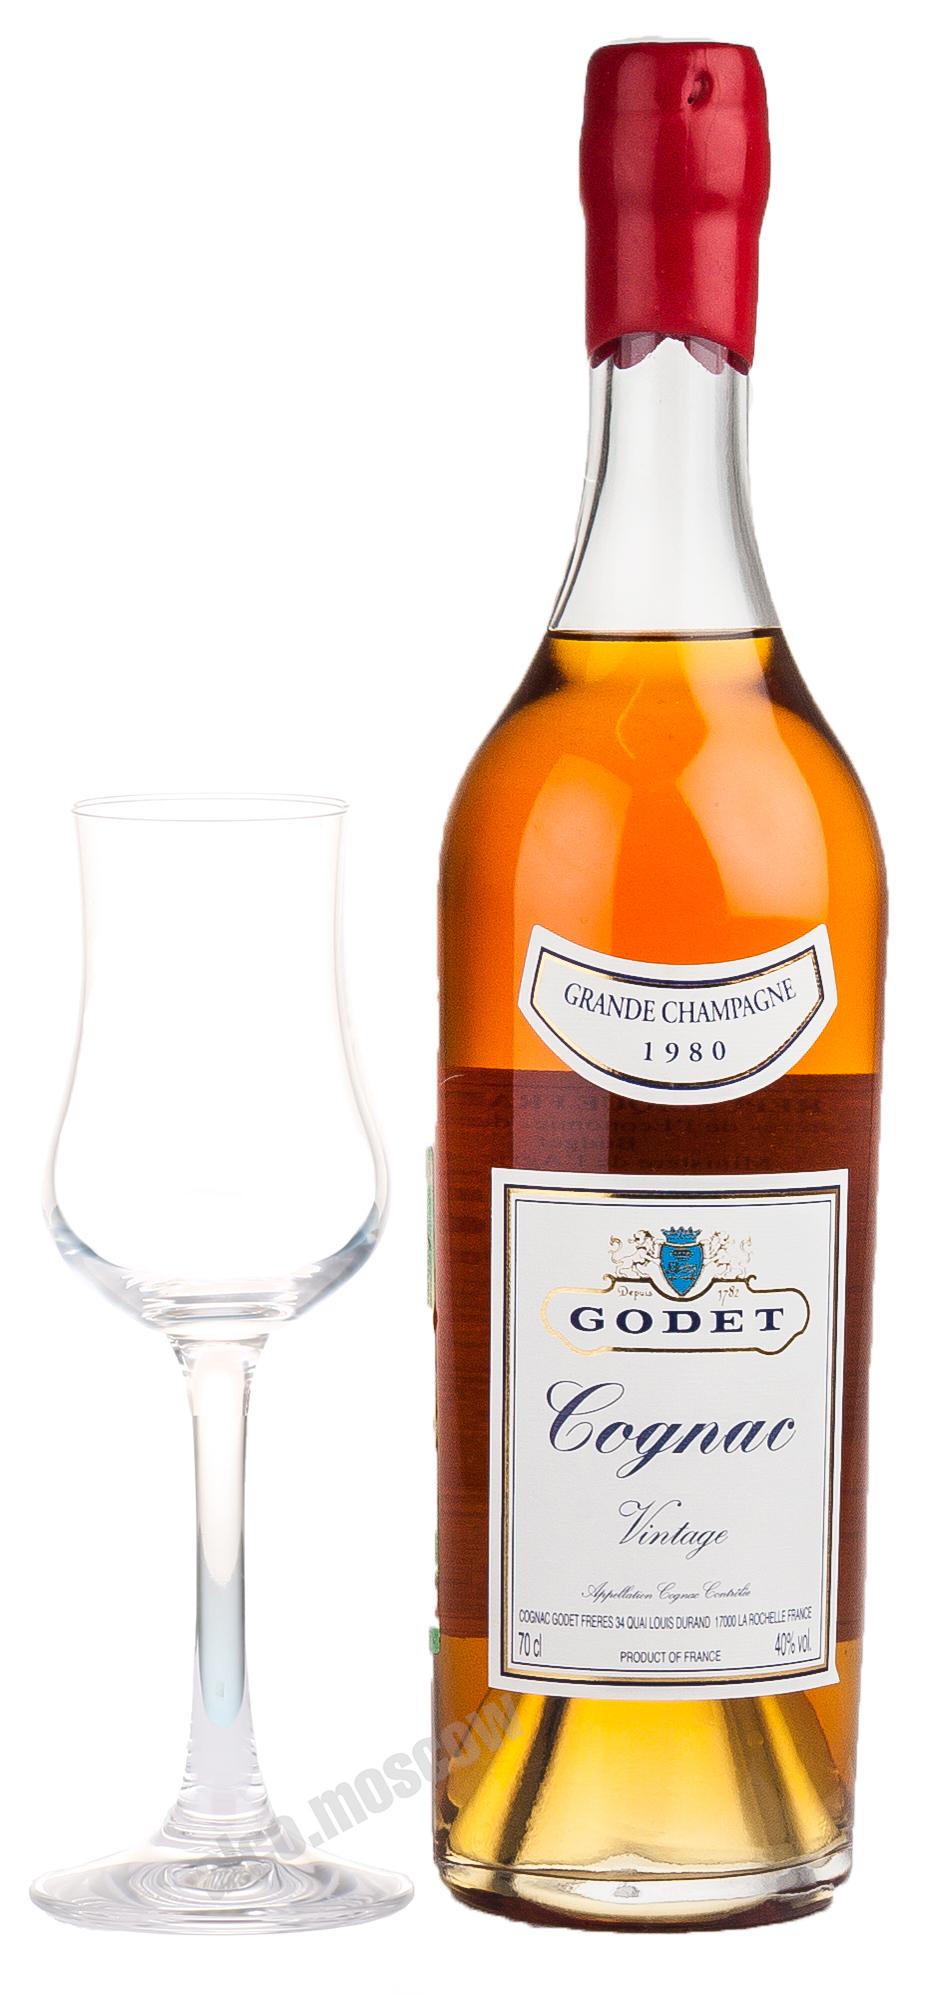 Godet Godet Vintage Grande Champagne 1980 0,7l Коньяк Годе Винтаж Гран Шампань 1980г 0,7л в д/у